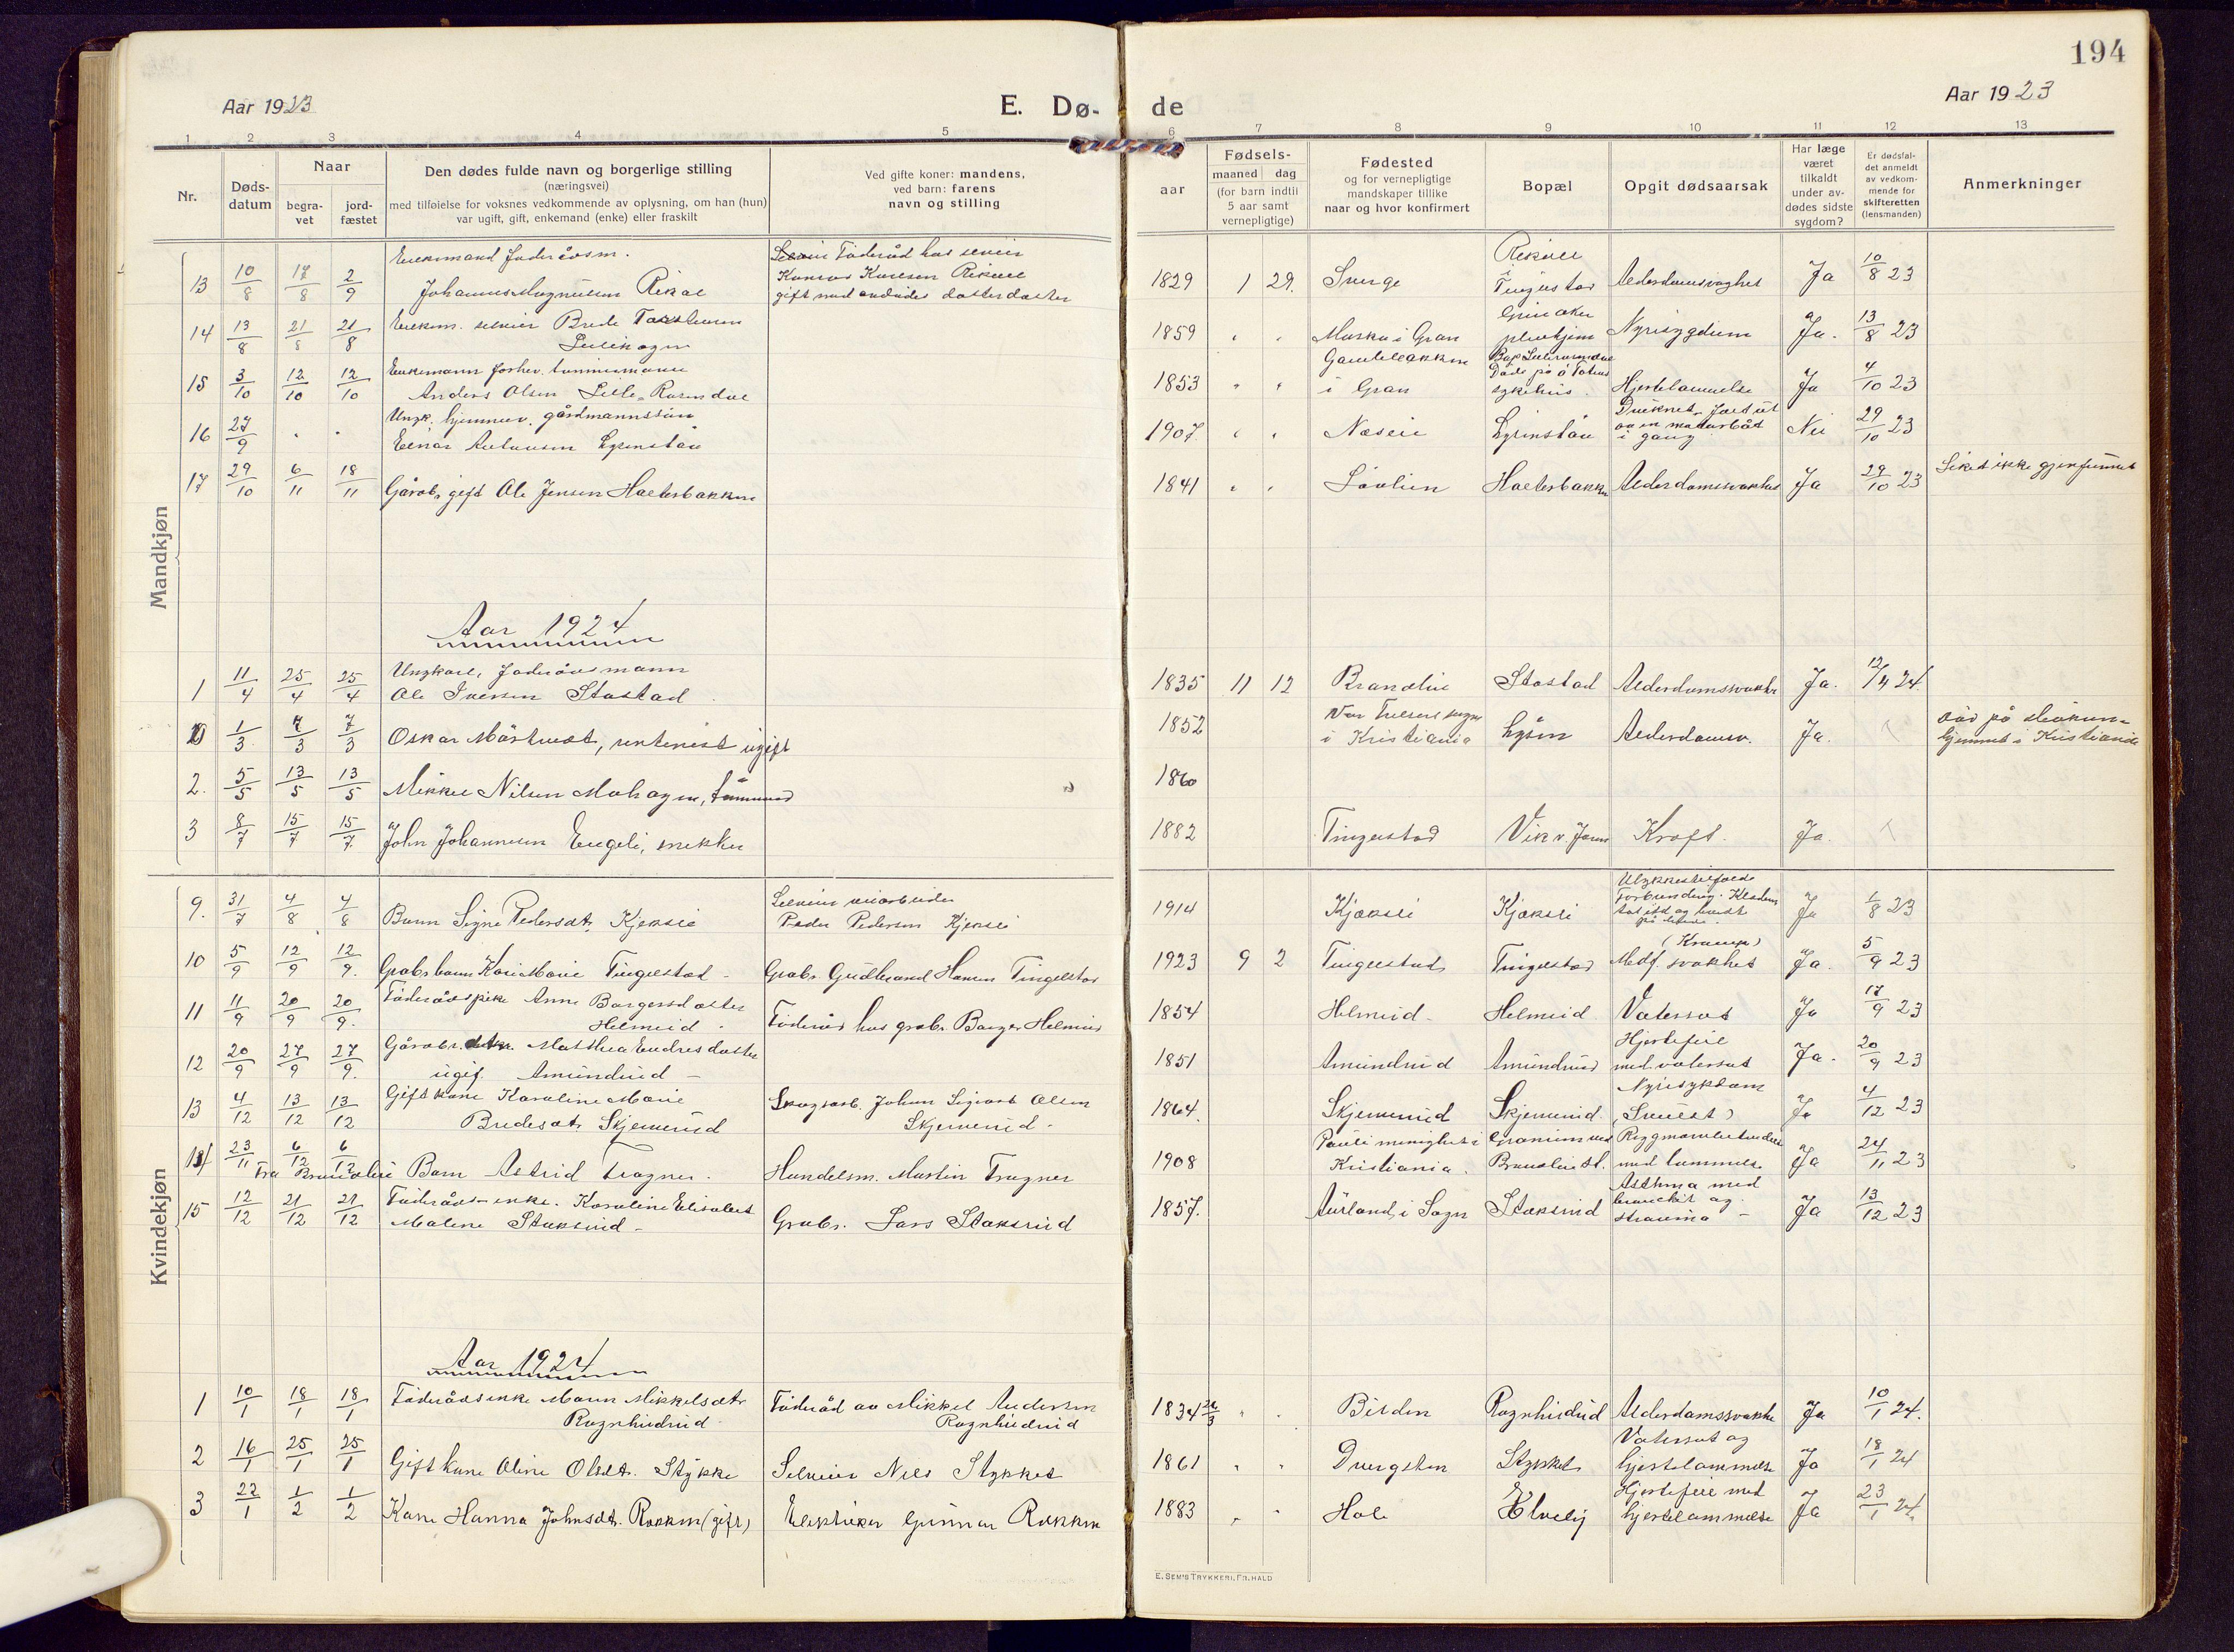 SAH, Brandbu prestekontor, Klokkerbok nr. 10, 1916-1930, s. 194